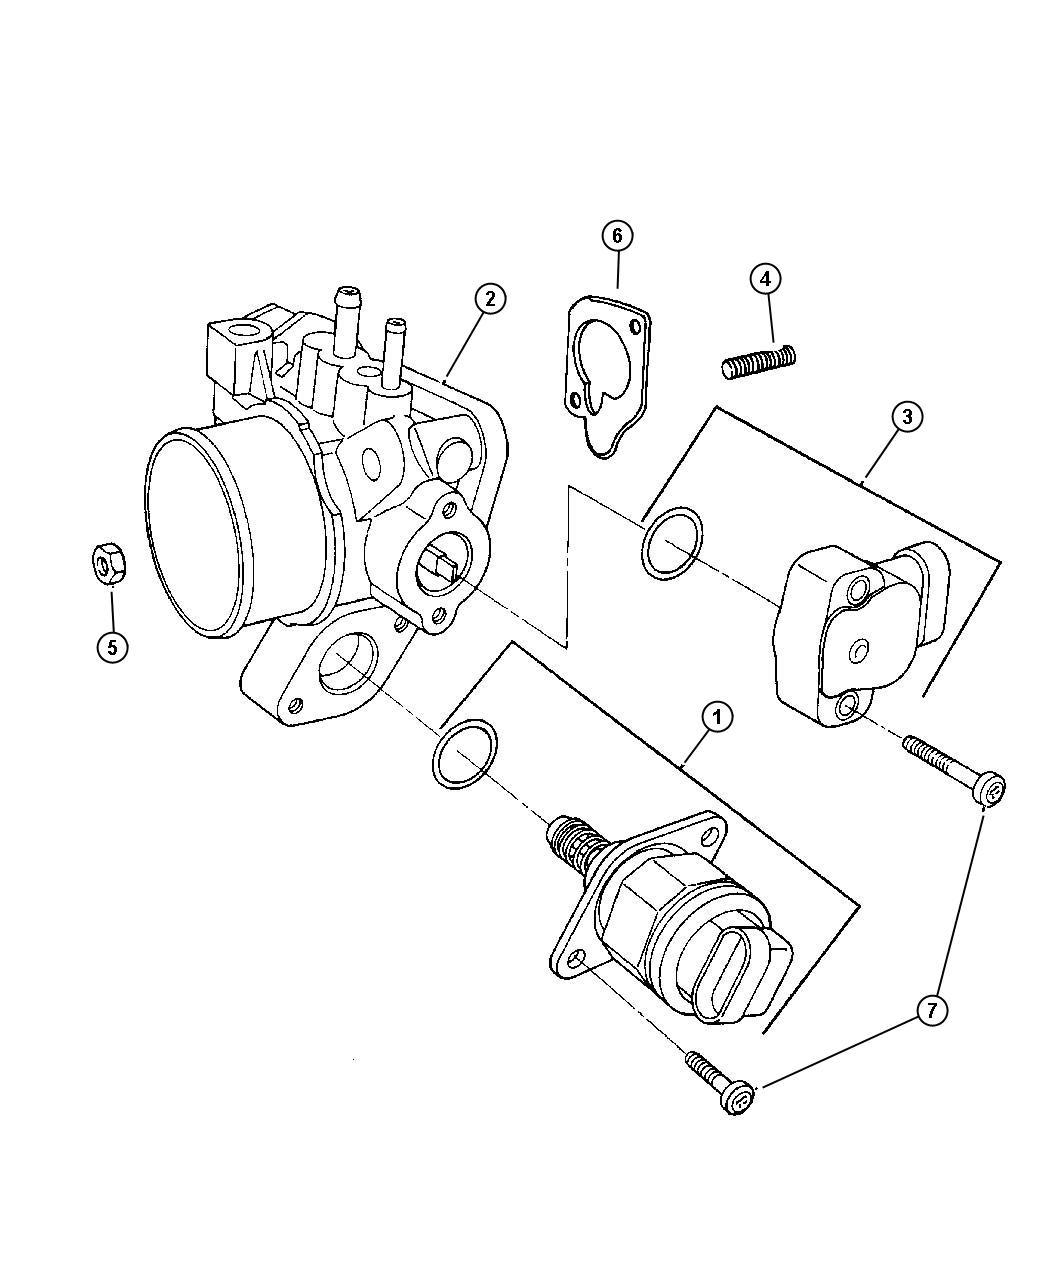 tags: #1993 buick park avenue engine diagram#2000 buick park avenue engine  diagram#1995 buick park avenue engine diagram#1998 buick lesabre engine